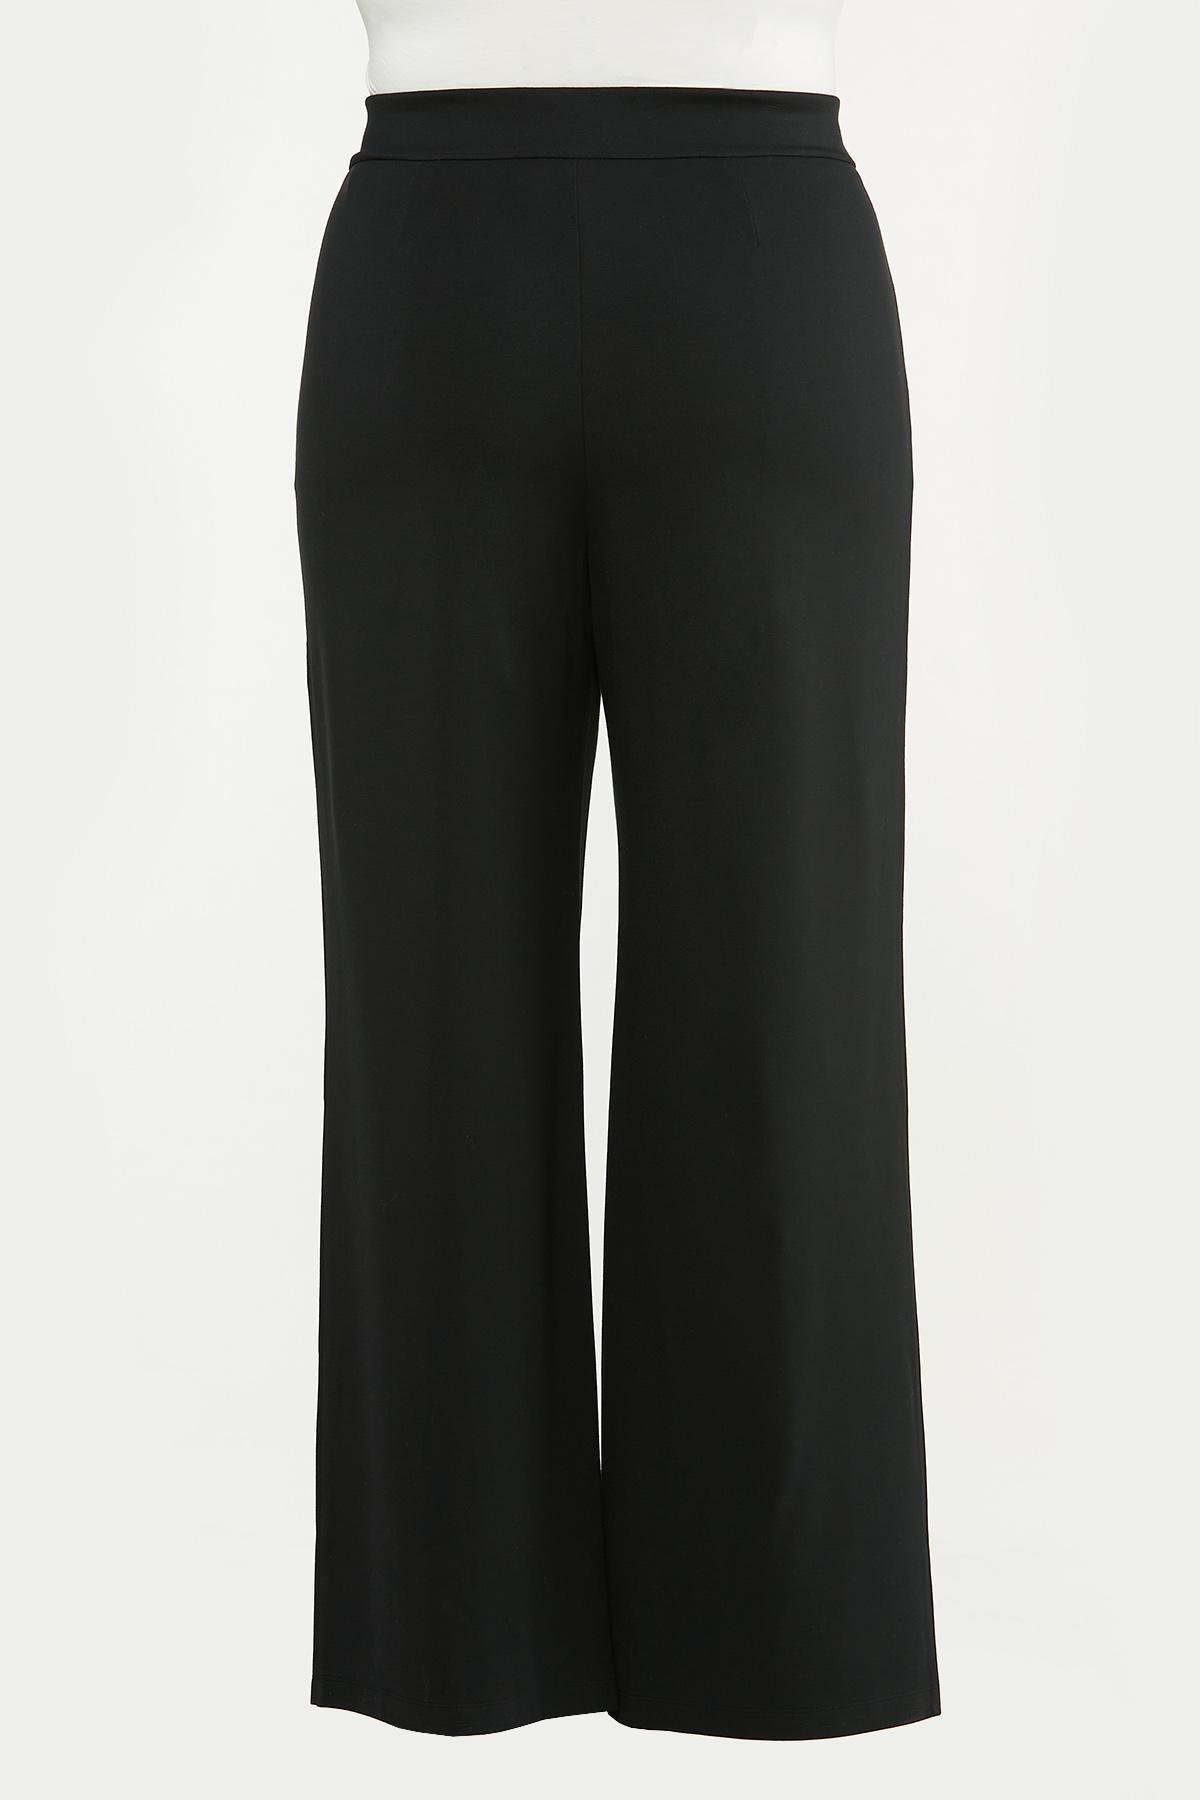 Plus Petite Tie Waist Ponte Pants (Item #44684886)